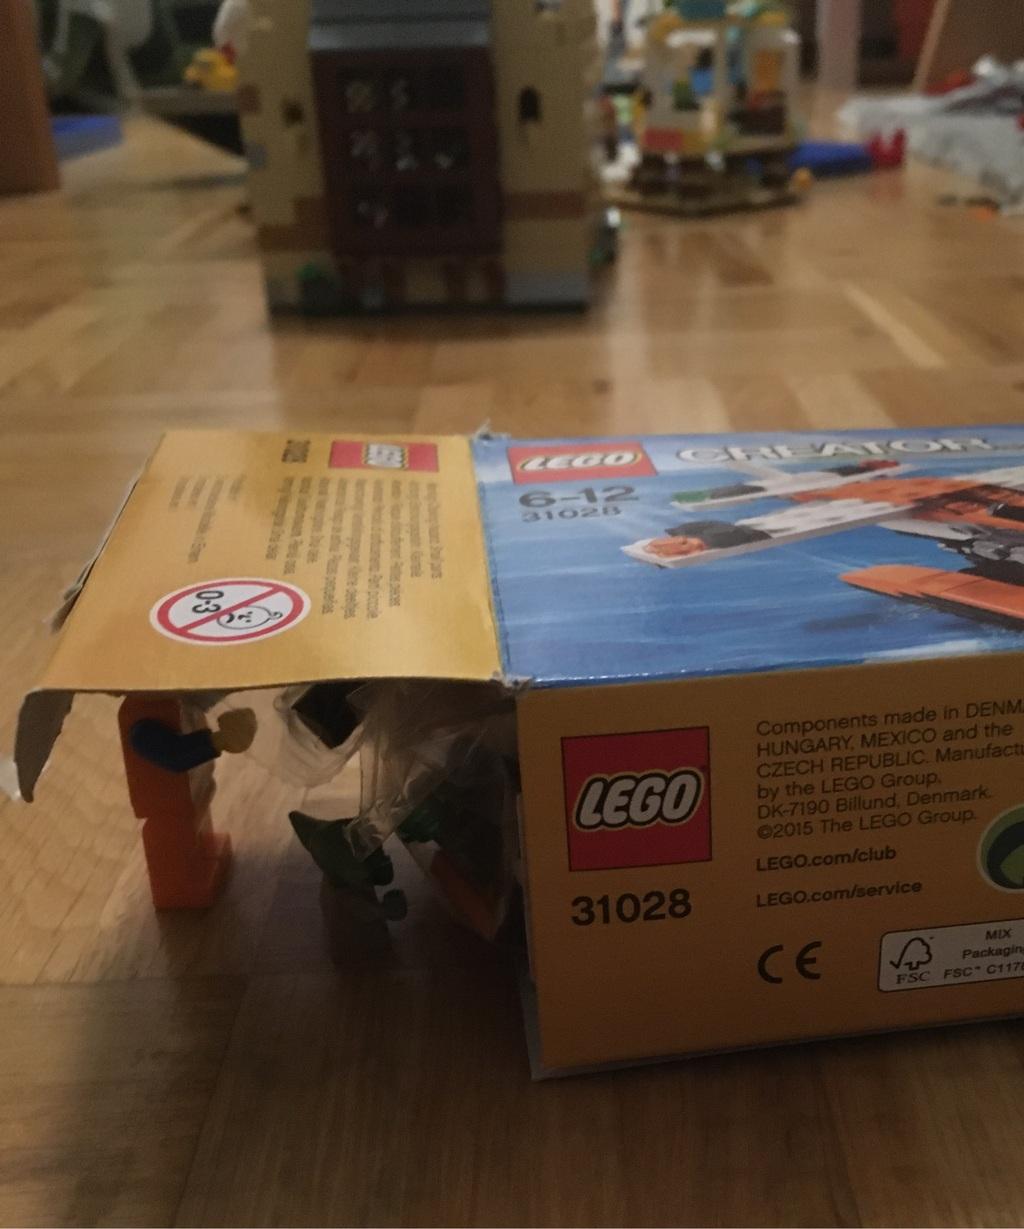 Mein neues Legoset